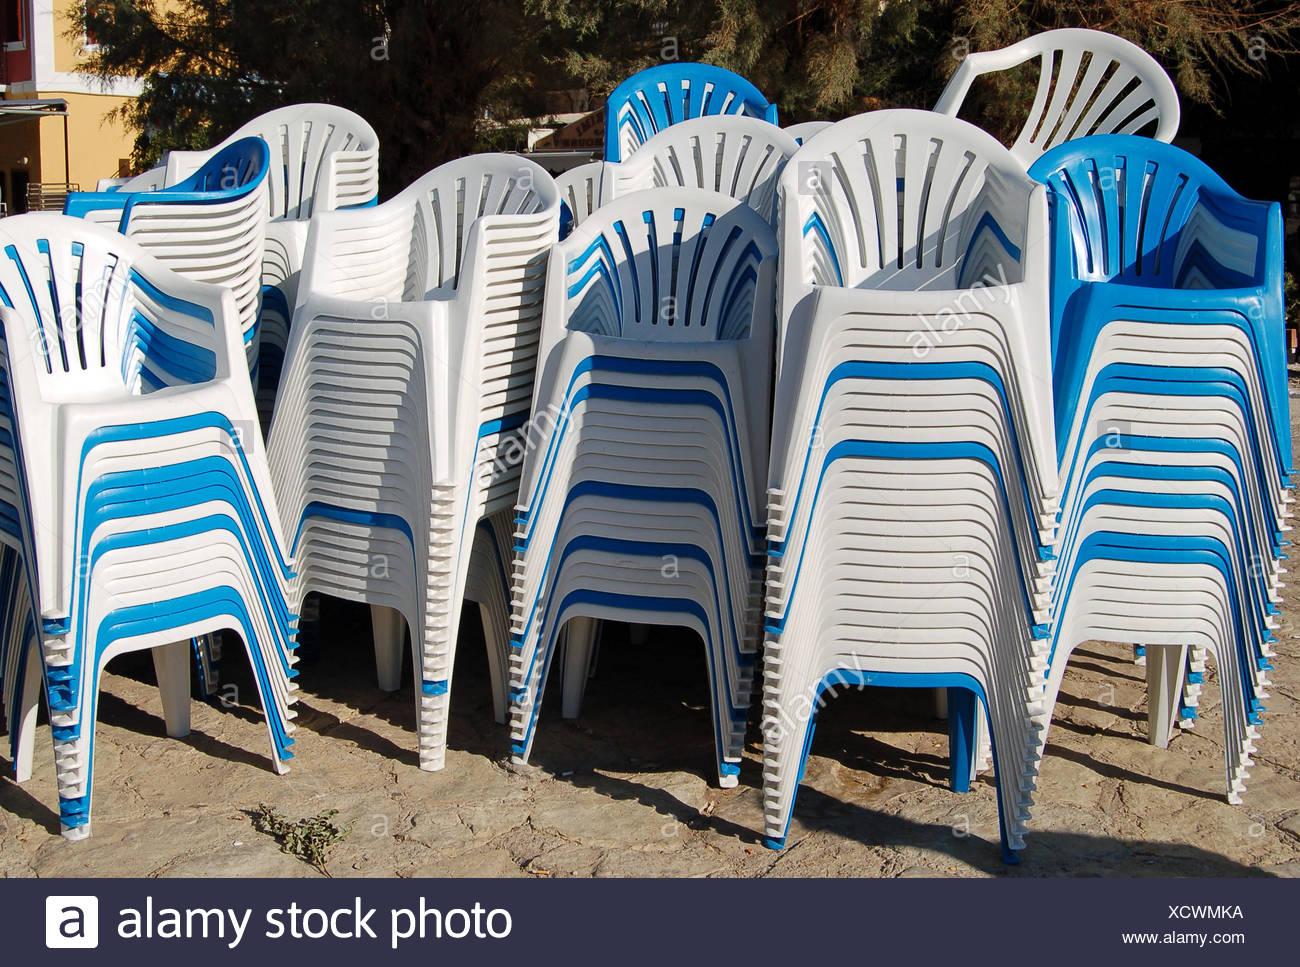 Blue Furniture New Blank European Caucasian Confusion Mess